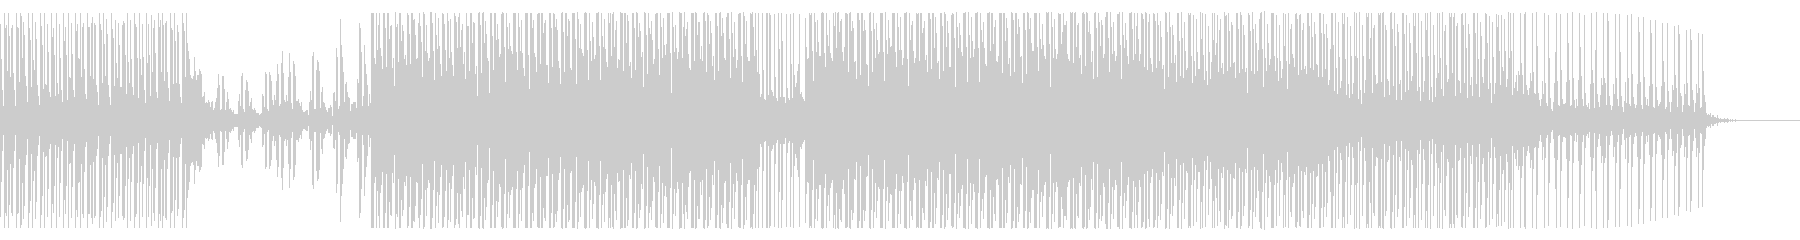 EDM/ハウス/夏っぽい爽やかさのポップの未再生の波形